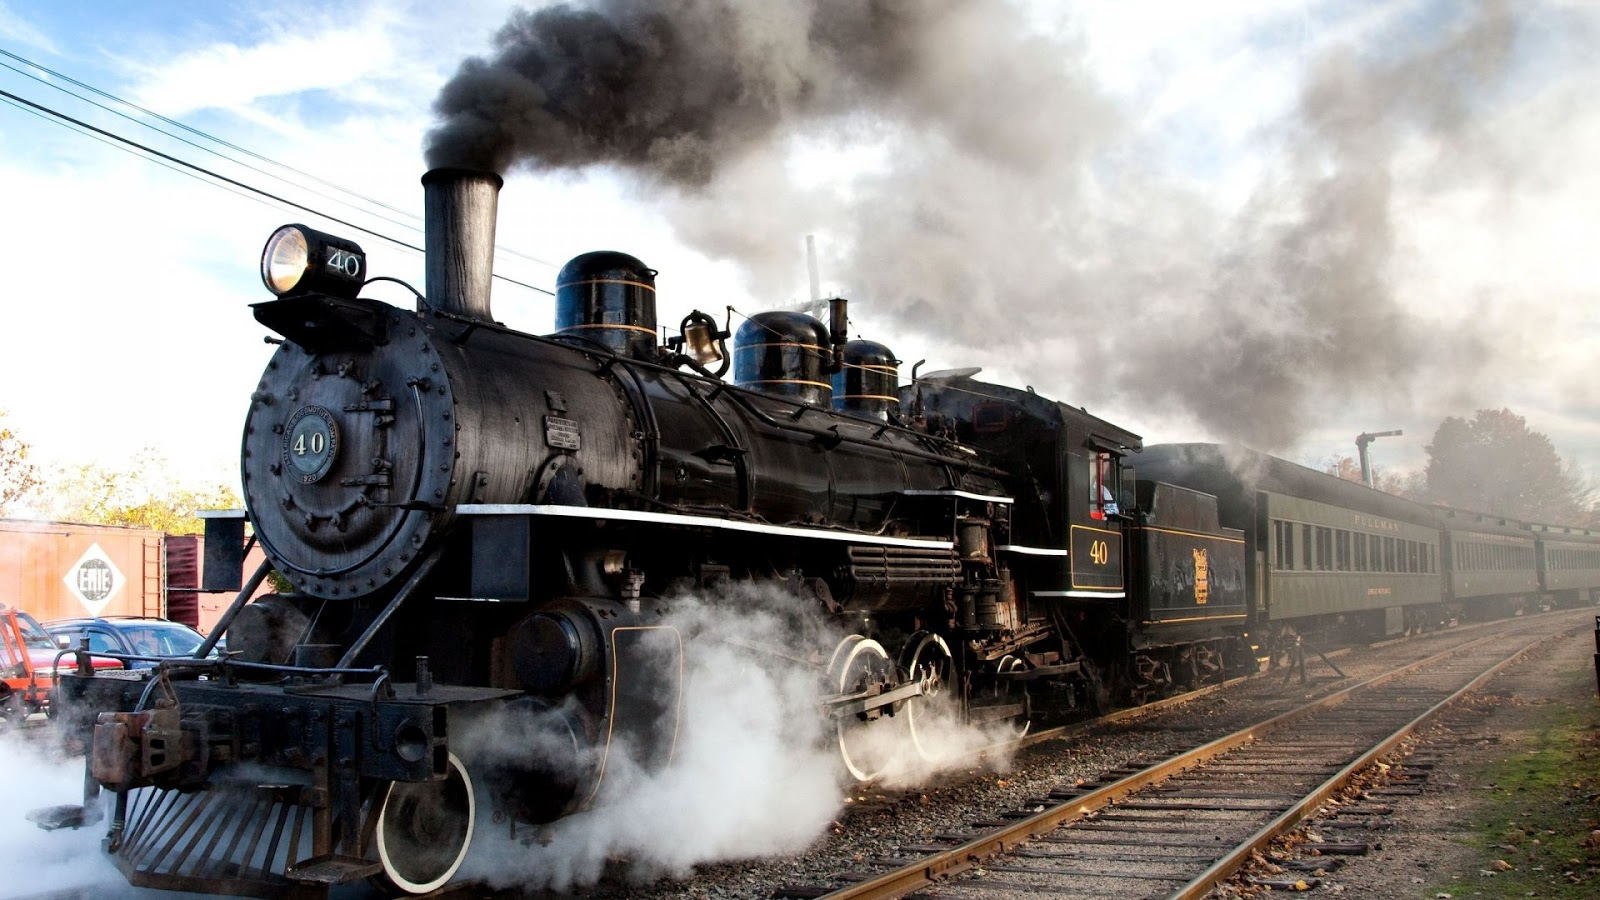 https://3.bp.blogspot.com/-KSmhUeK8xwo/UcXi7mX-cPI/AAAAAAAALAE/Qv23OEF3-CE/s1600/Train-hd-wallpapers.jpg